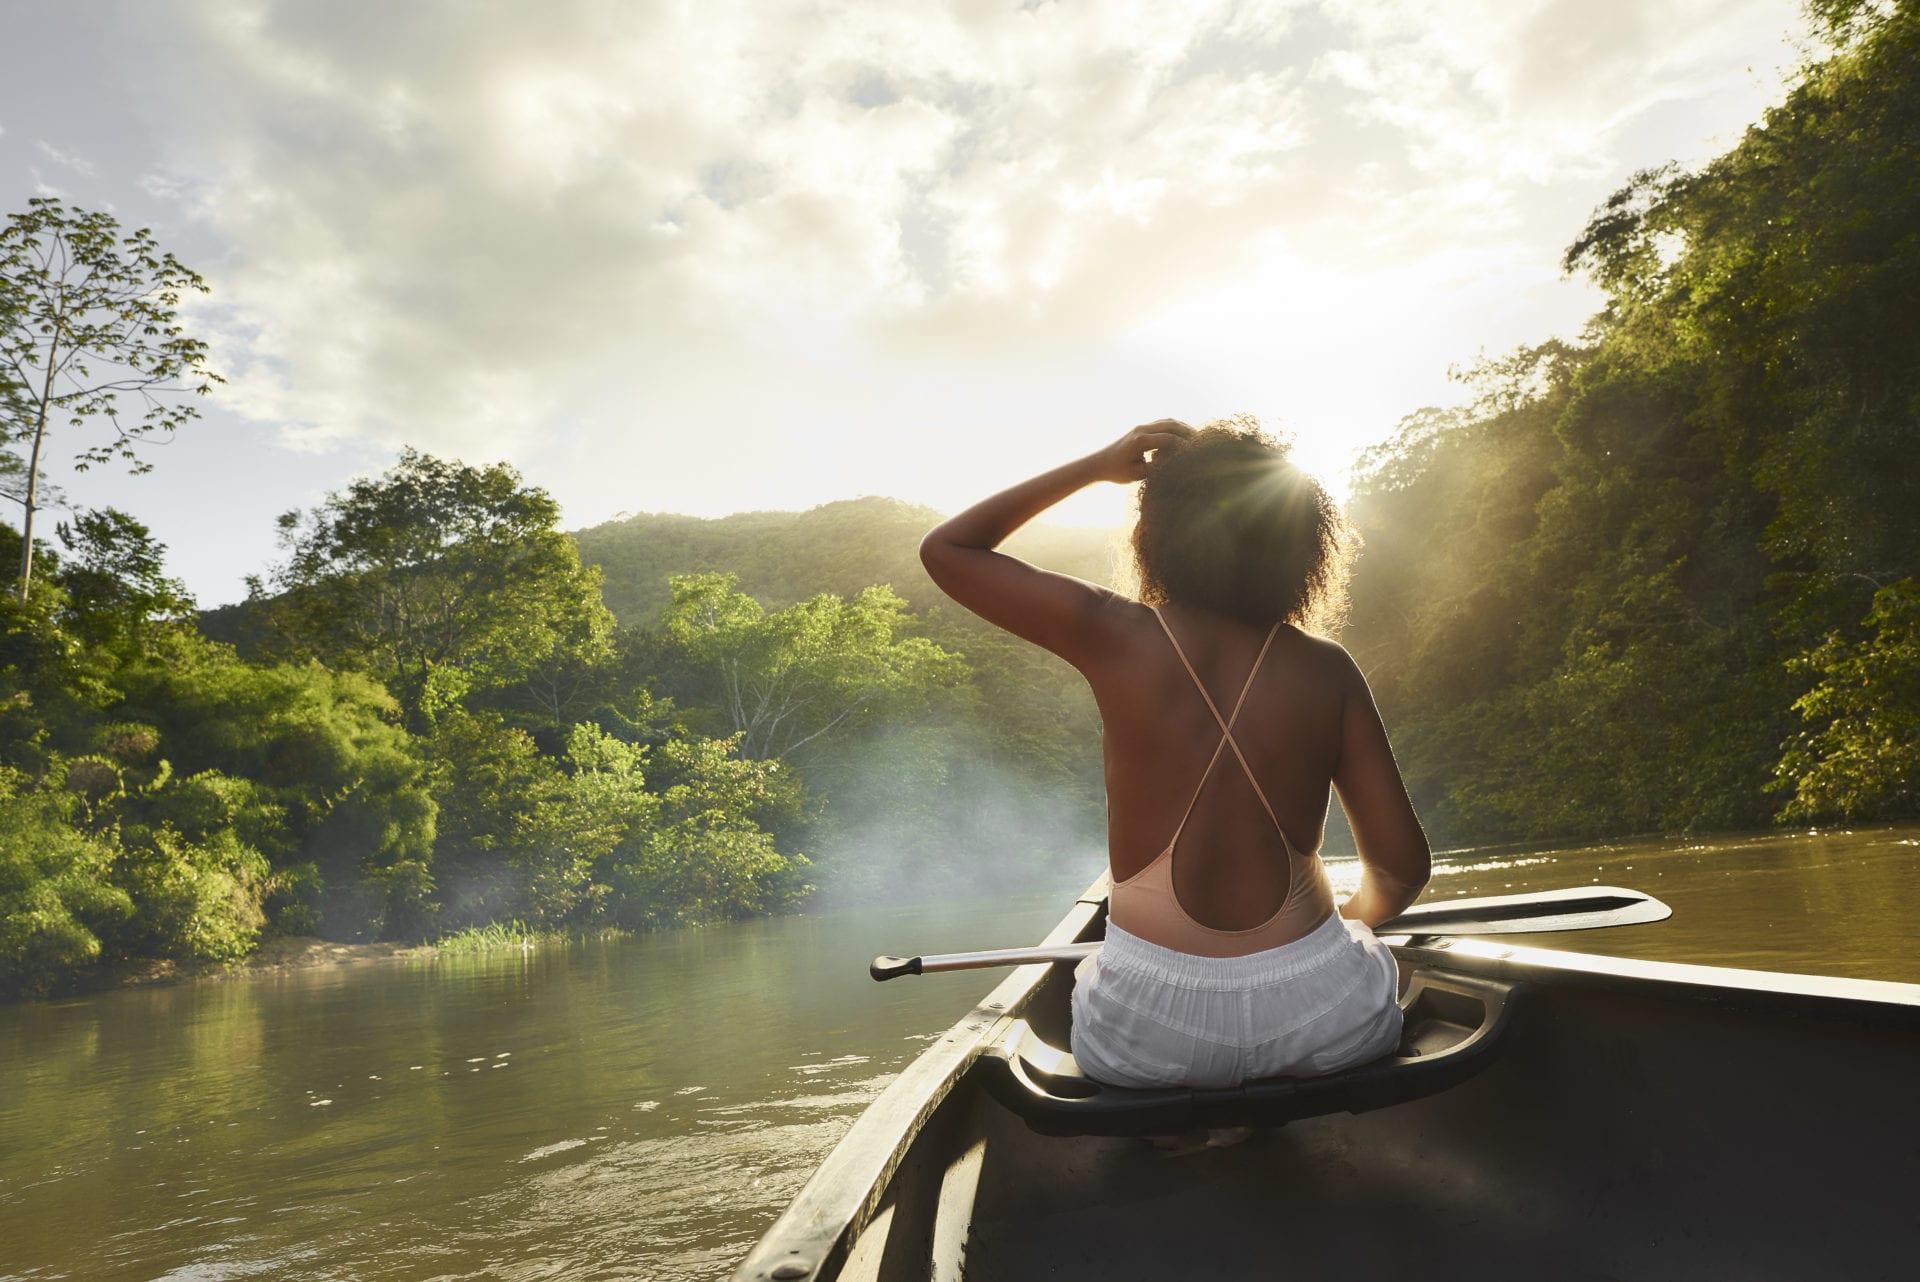 canoe ride in cayo